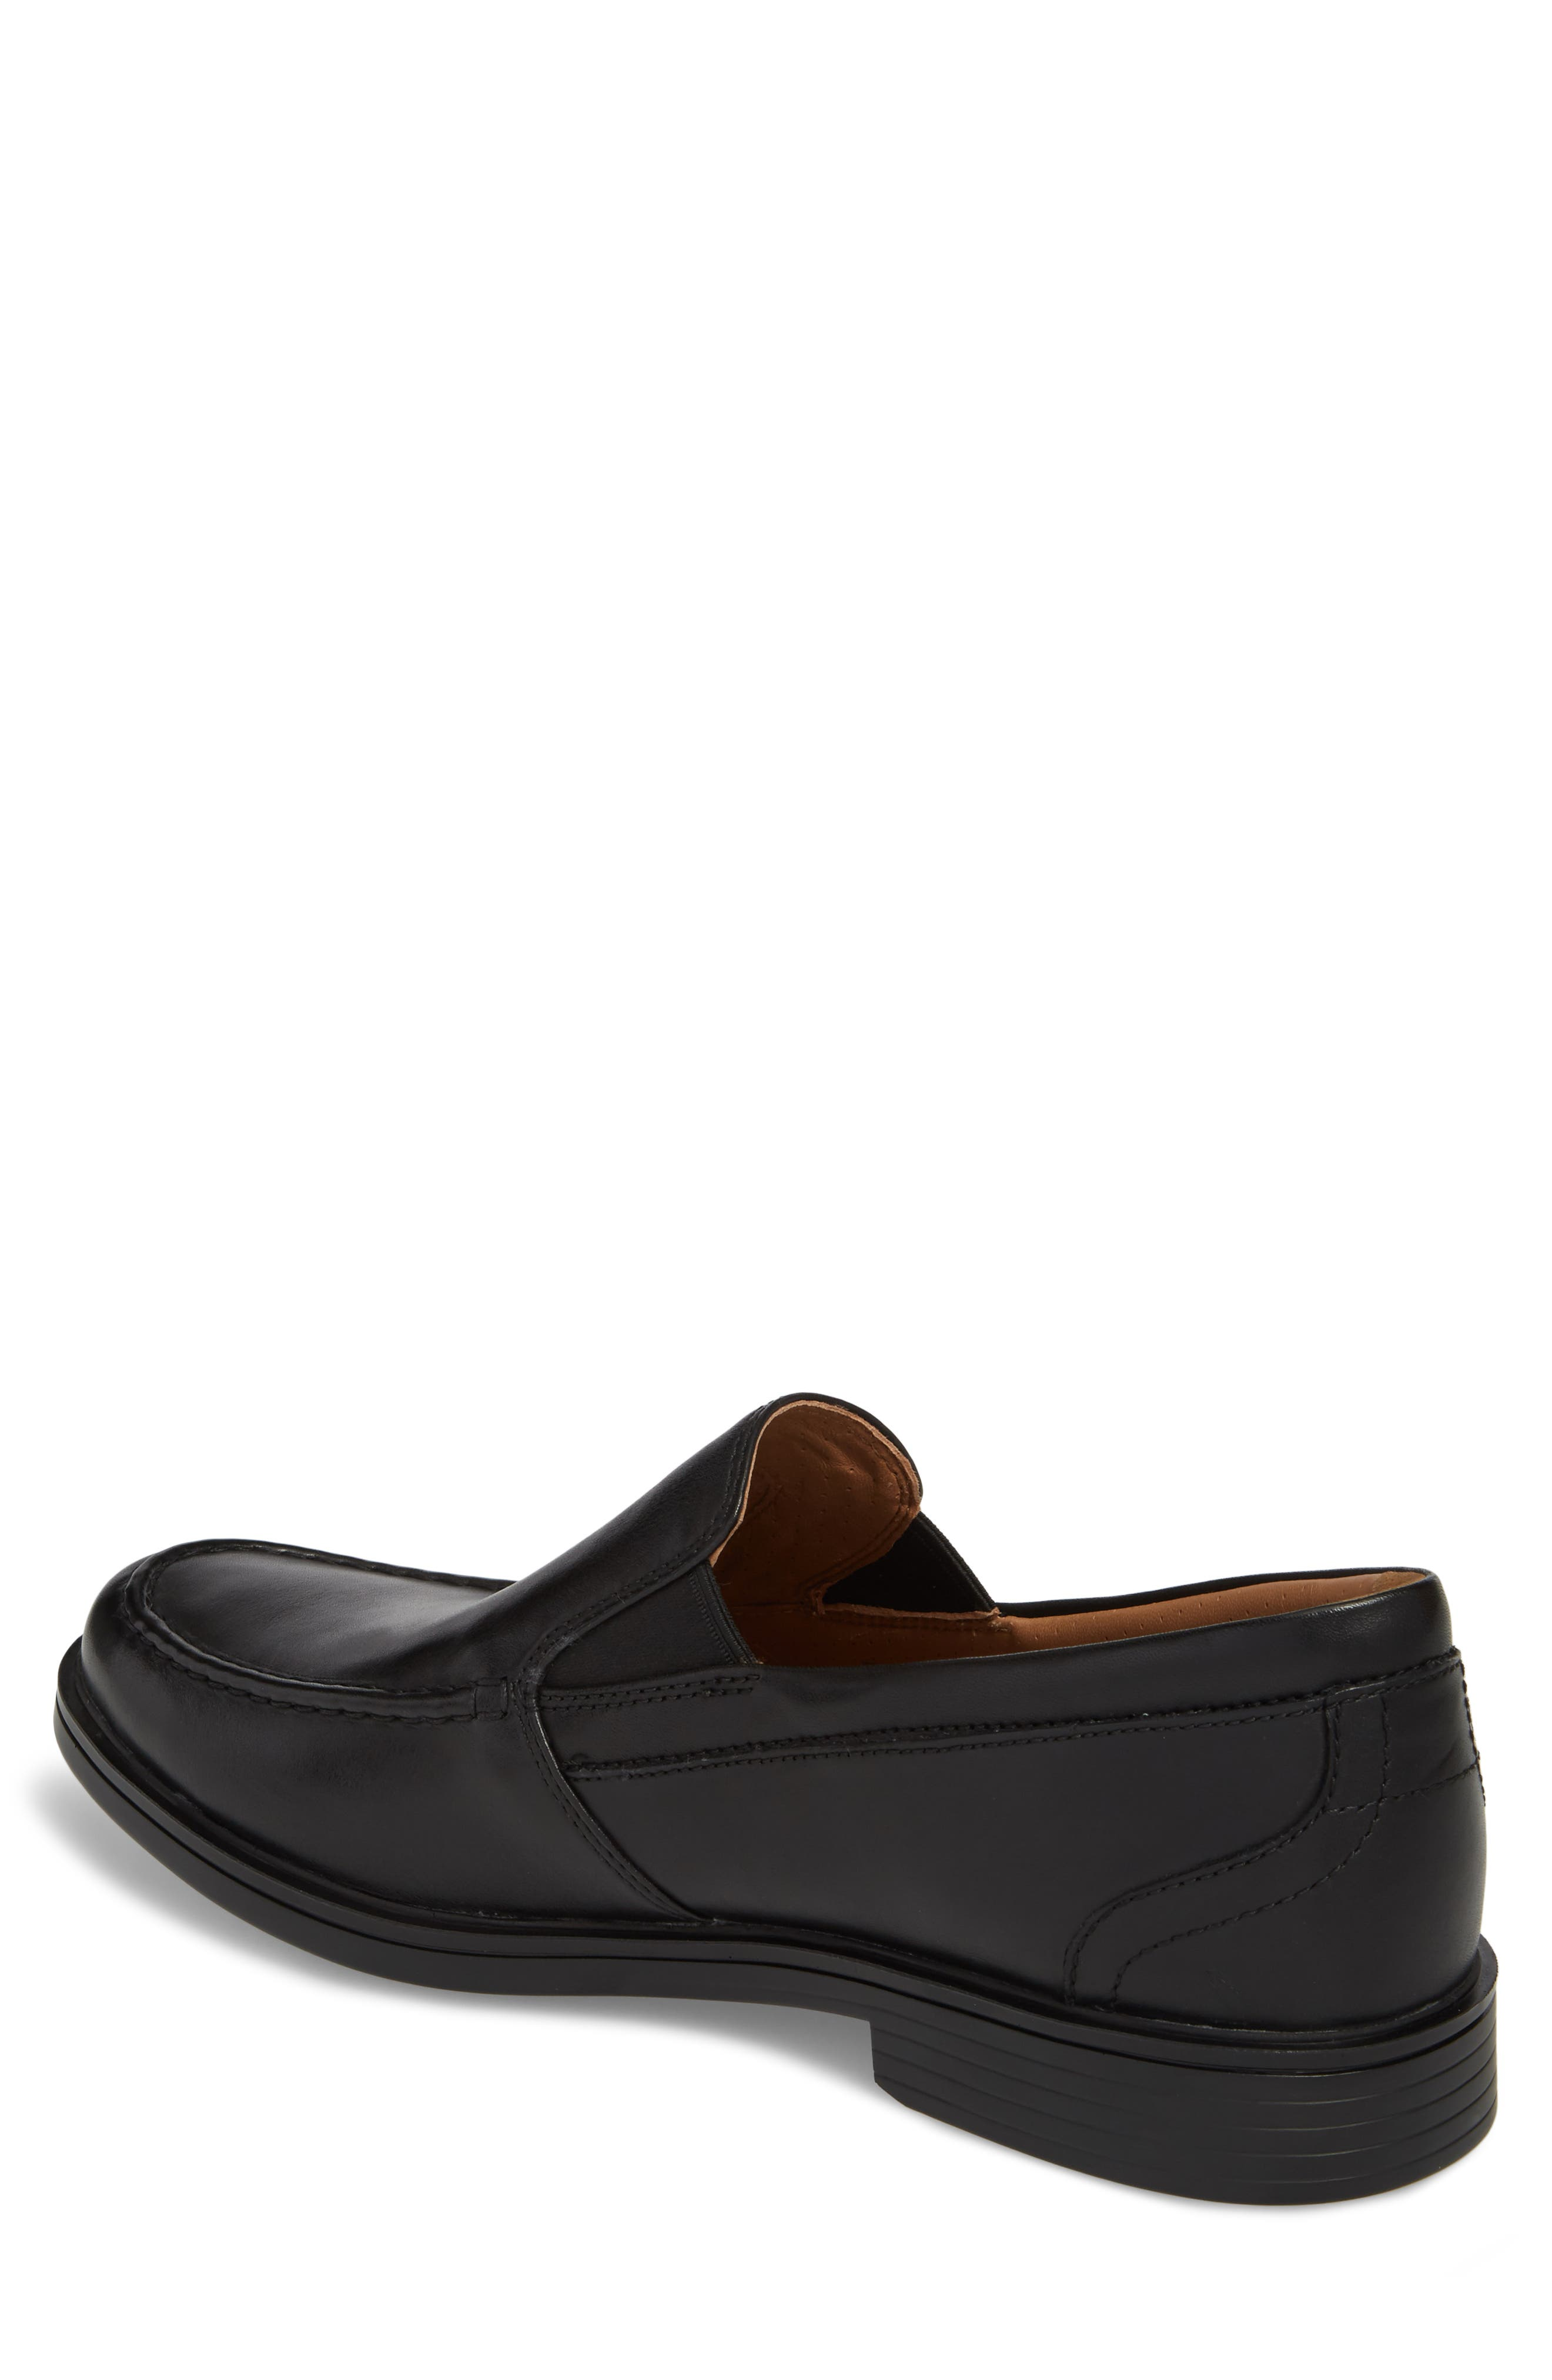 Unaldric Apron Toe Loafer,                             Alternate thumbnail 2, color,                             Black Leather